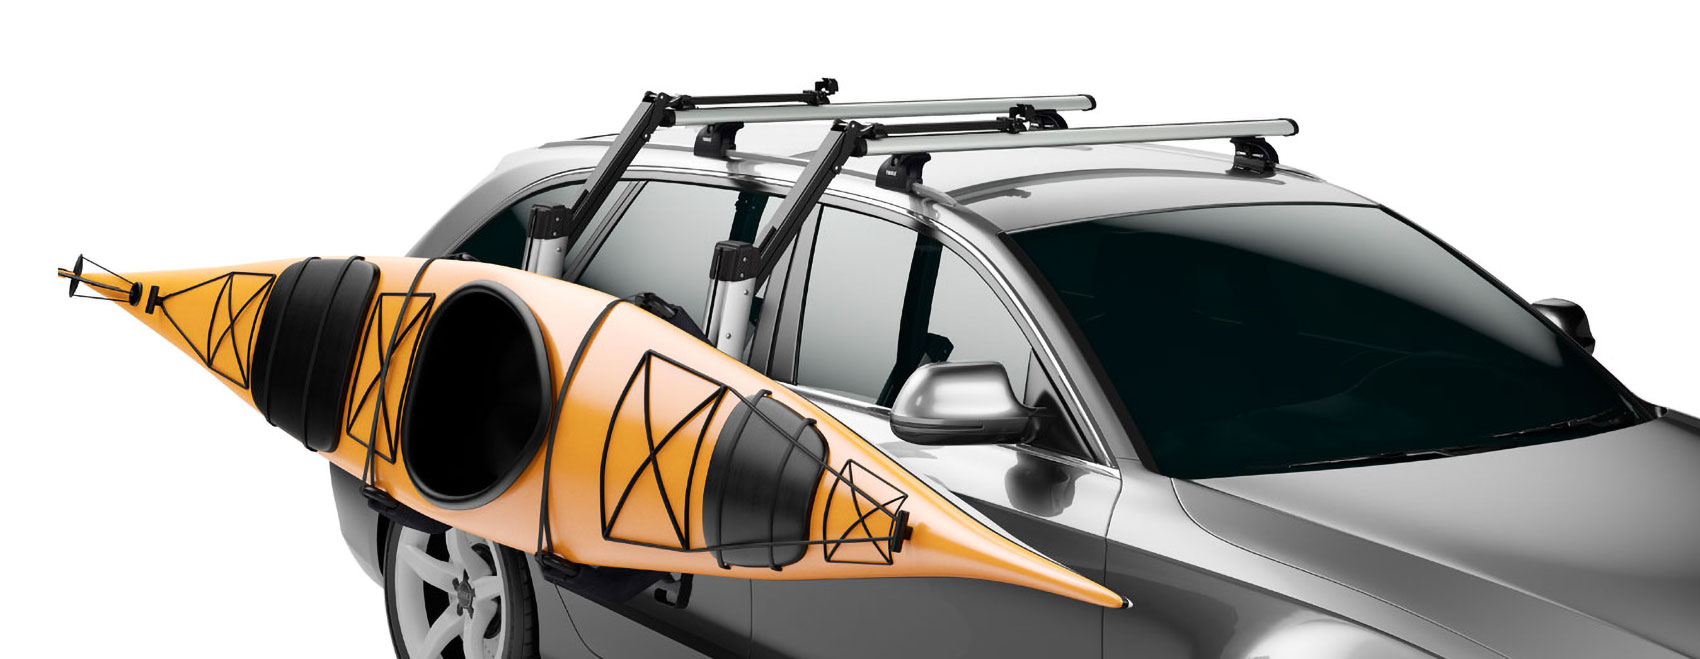 Karitek's Easy Load Roof Rack - transforms loading kayaks and canoes onto cars and vans